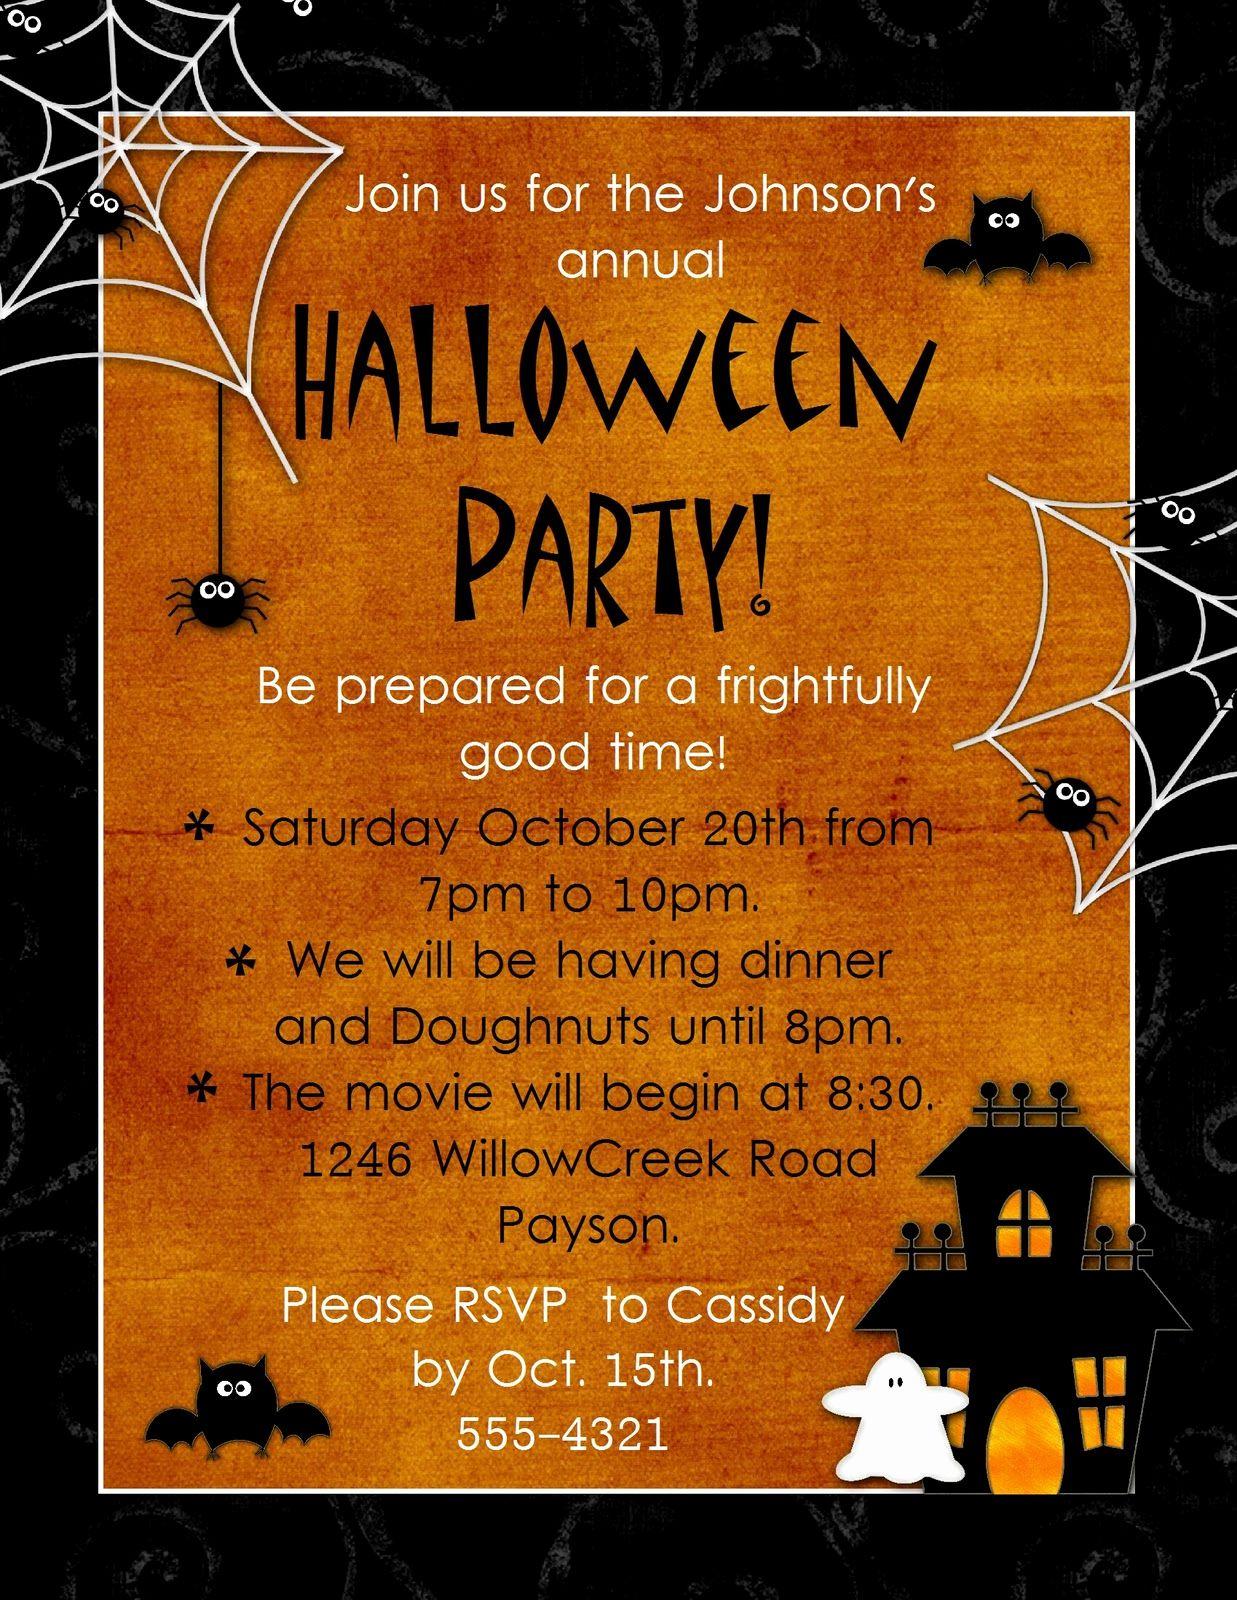 Free Halloween Party Invitation Templates Inspirational Geneawebinar Halloween Party Invitation Template Party Invite Template Free Halloween Party Invitations